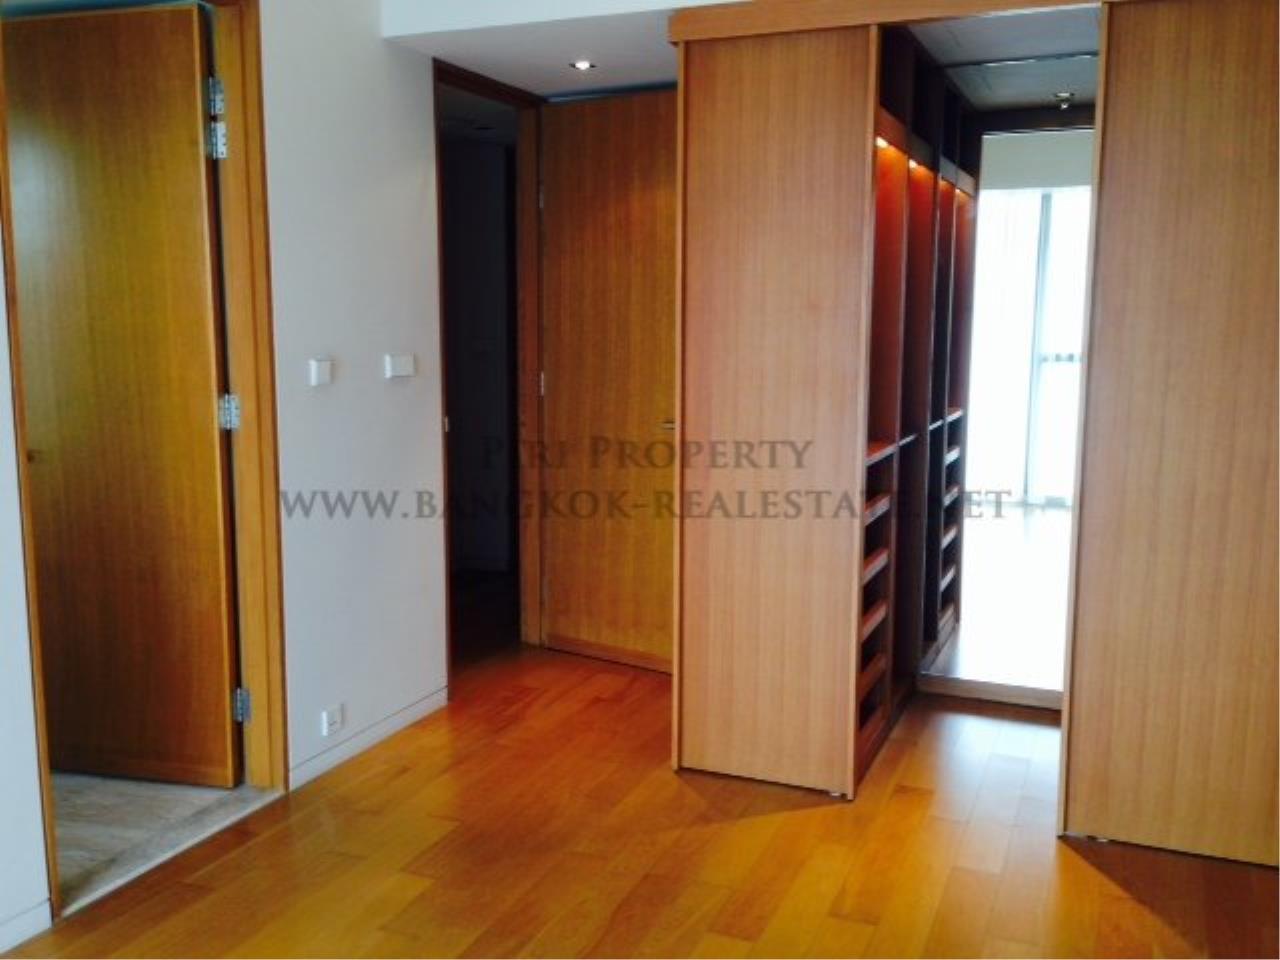 Piri Property Agency's 2 Bedroom Condo on Super High Floor - The River Condo 1